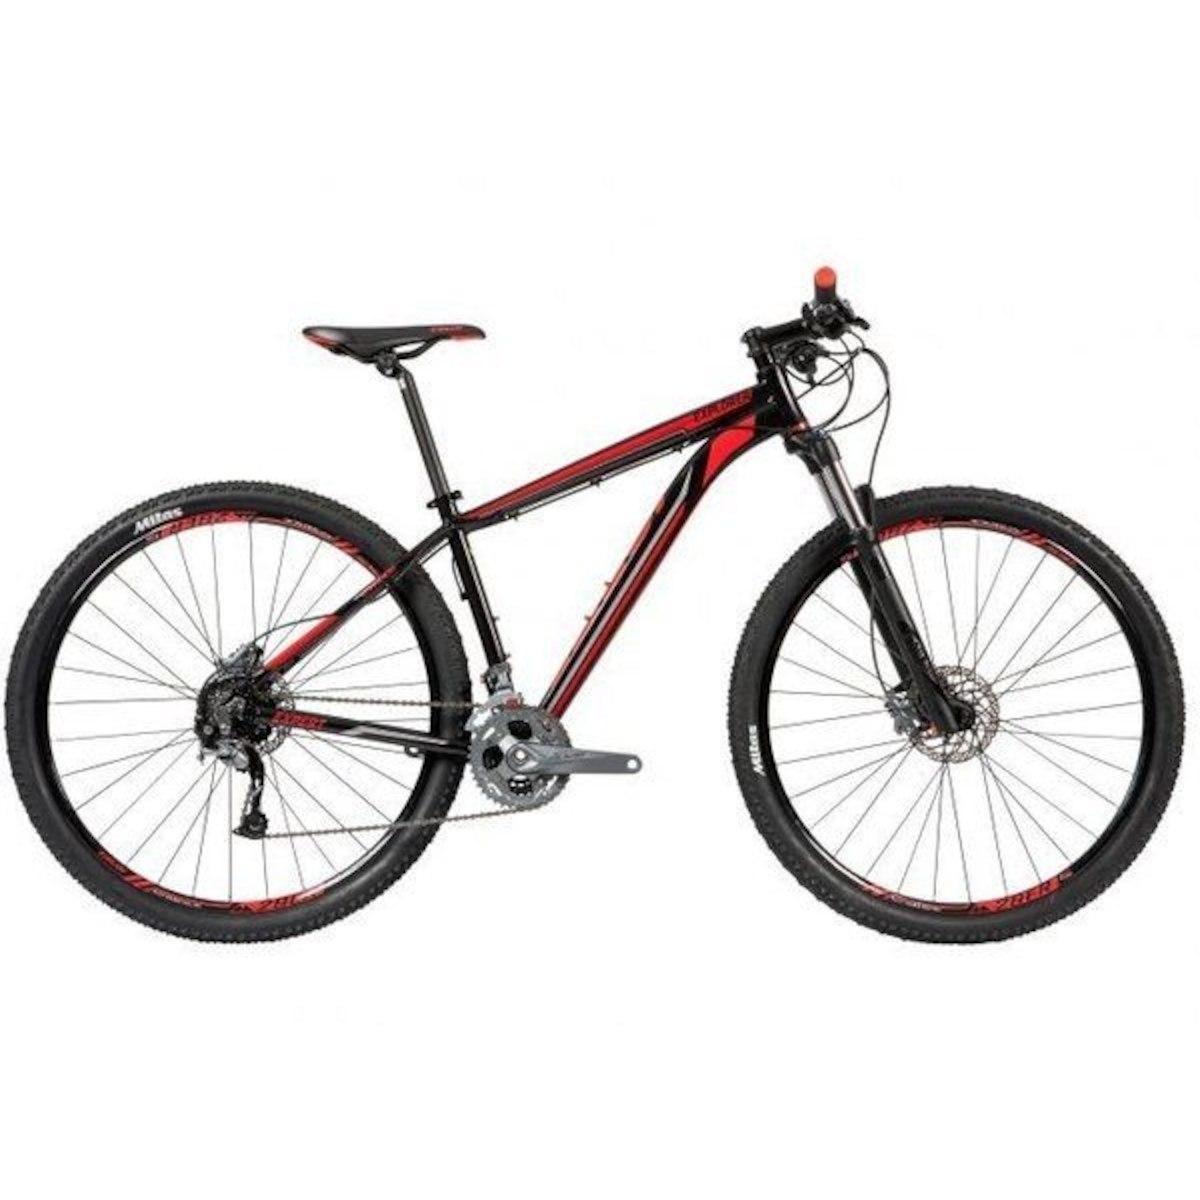 Bicicleta 29 Caloi Explorer Expert 2018